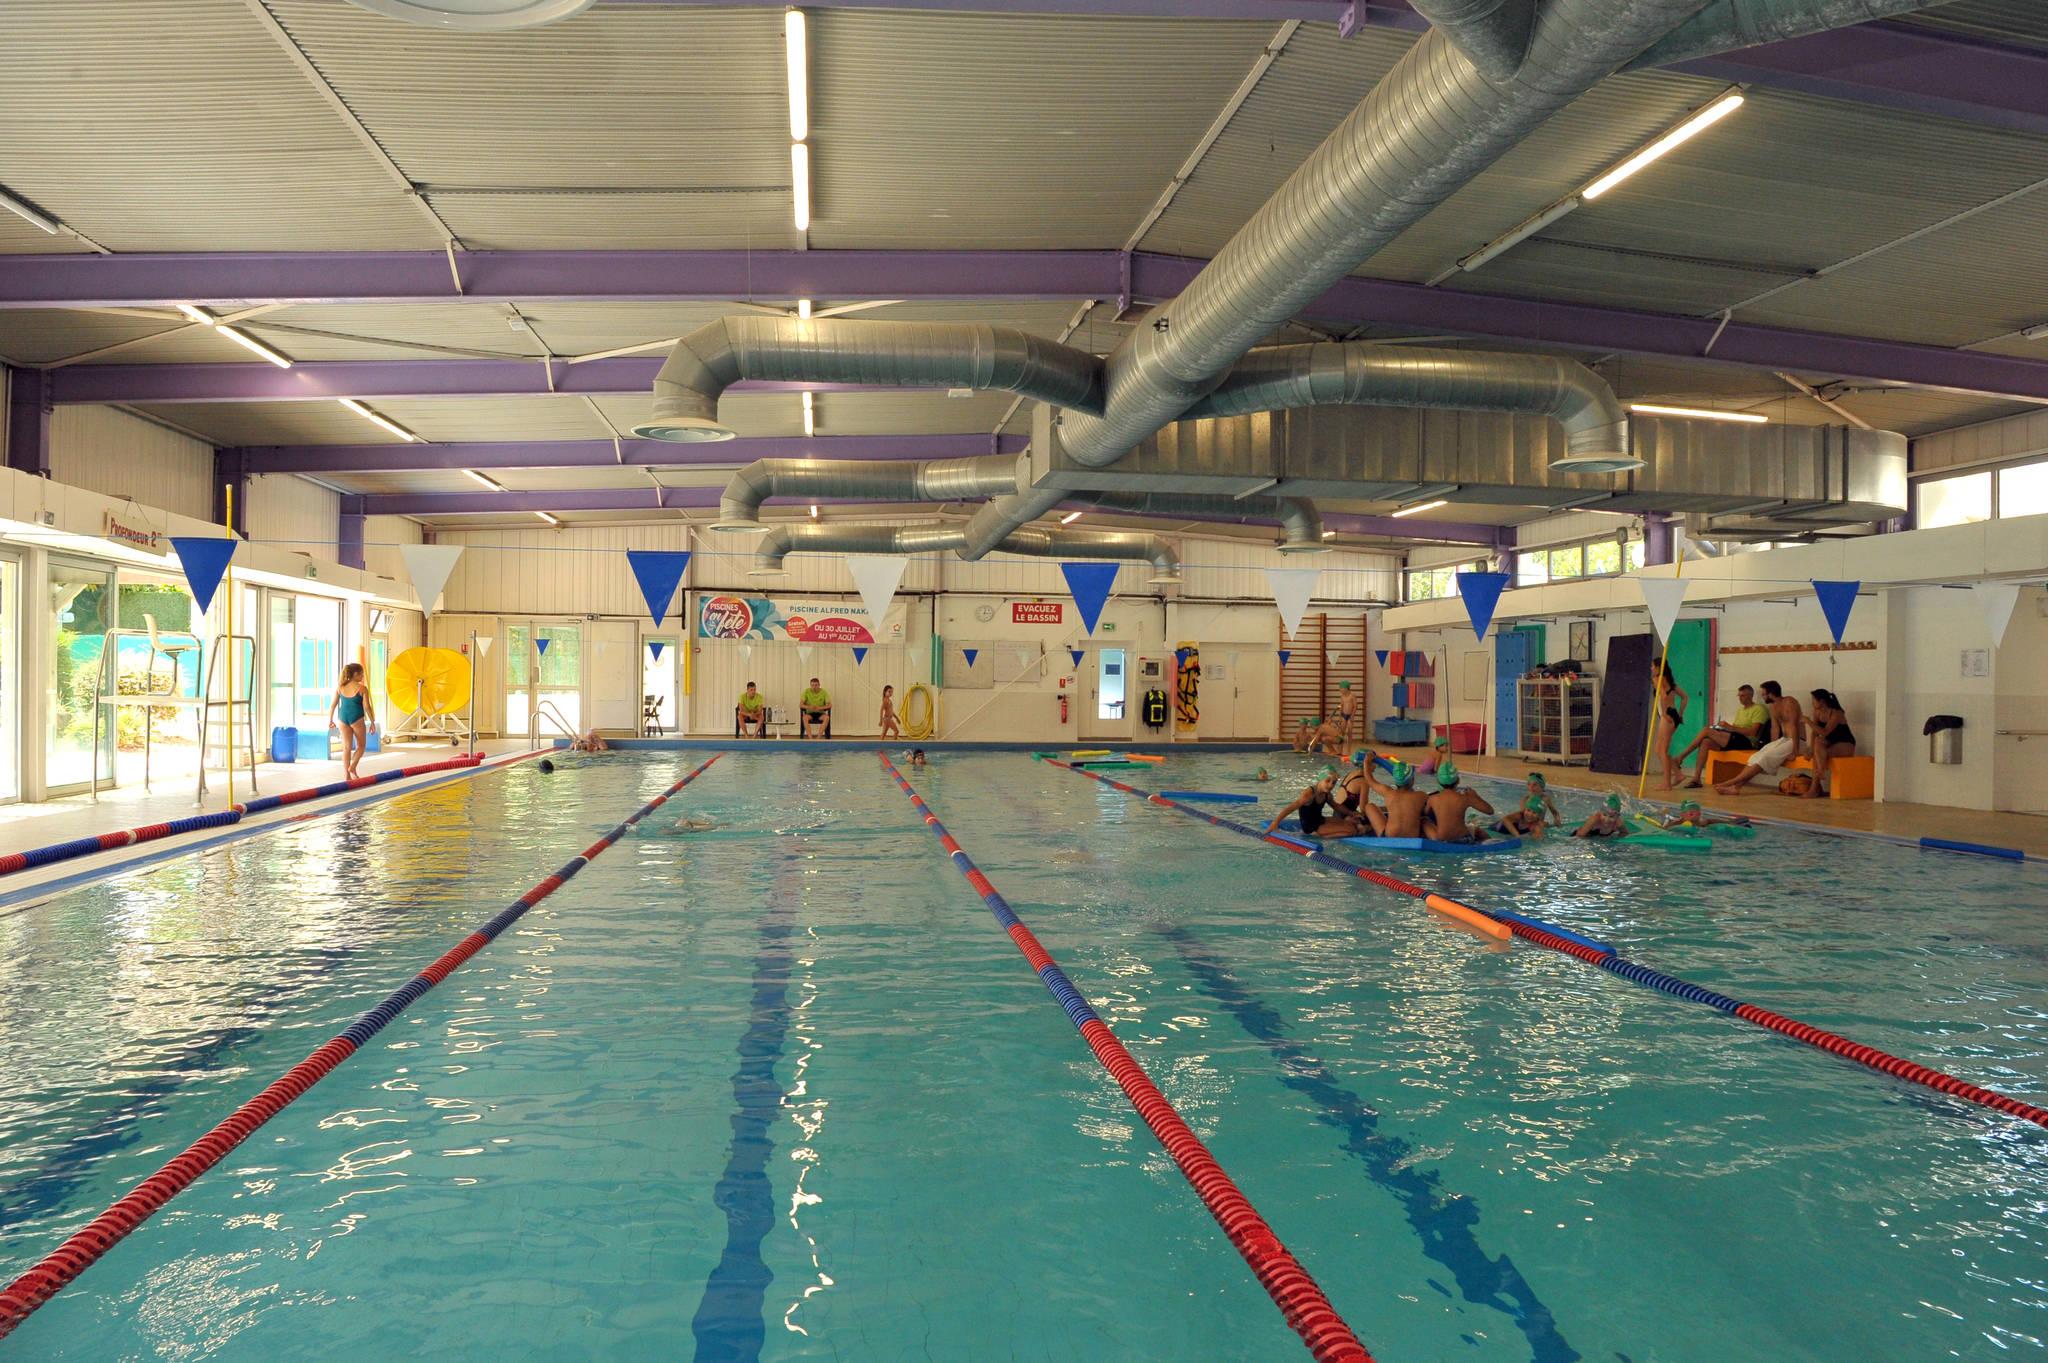 Piscine Alfred Nakache, Swimming-Pool - Montpellier Tourist ... destiné Piscine Originale